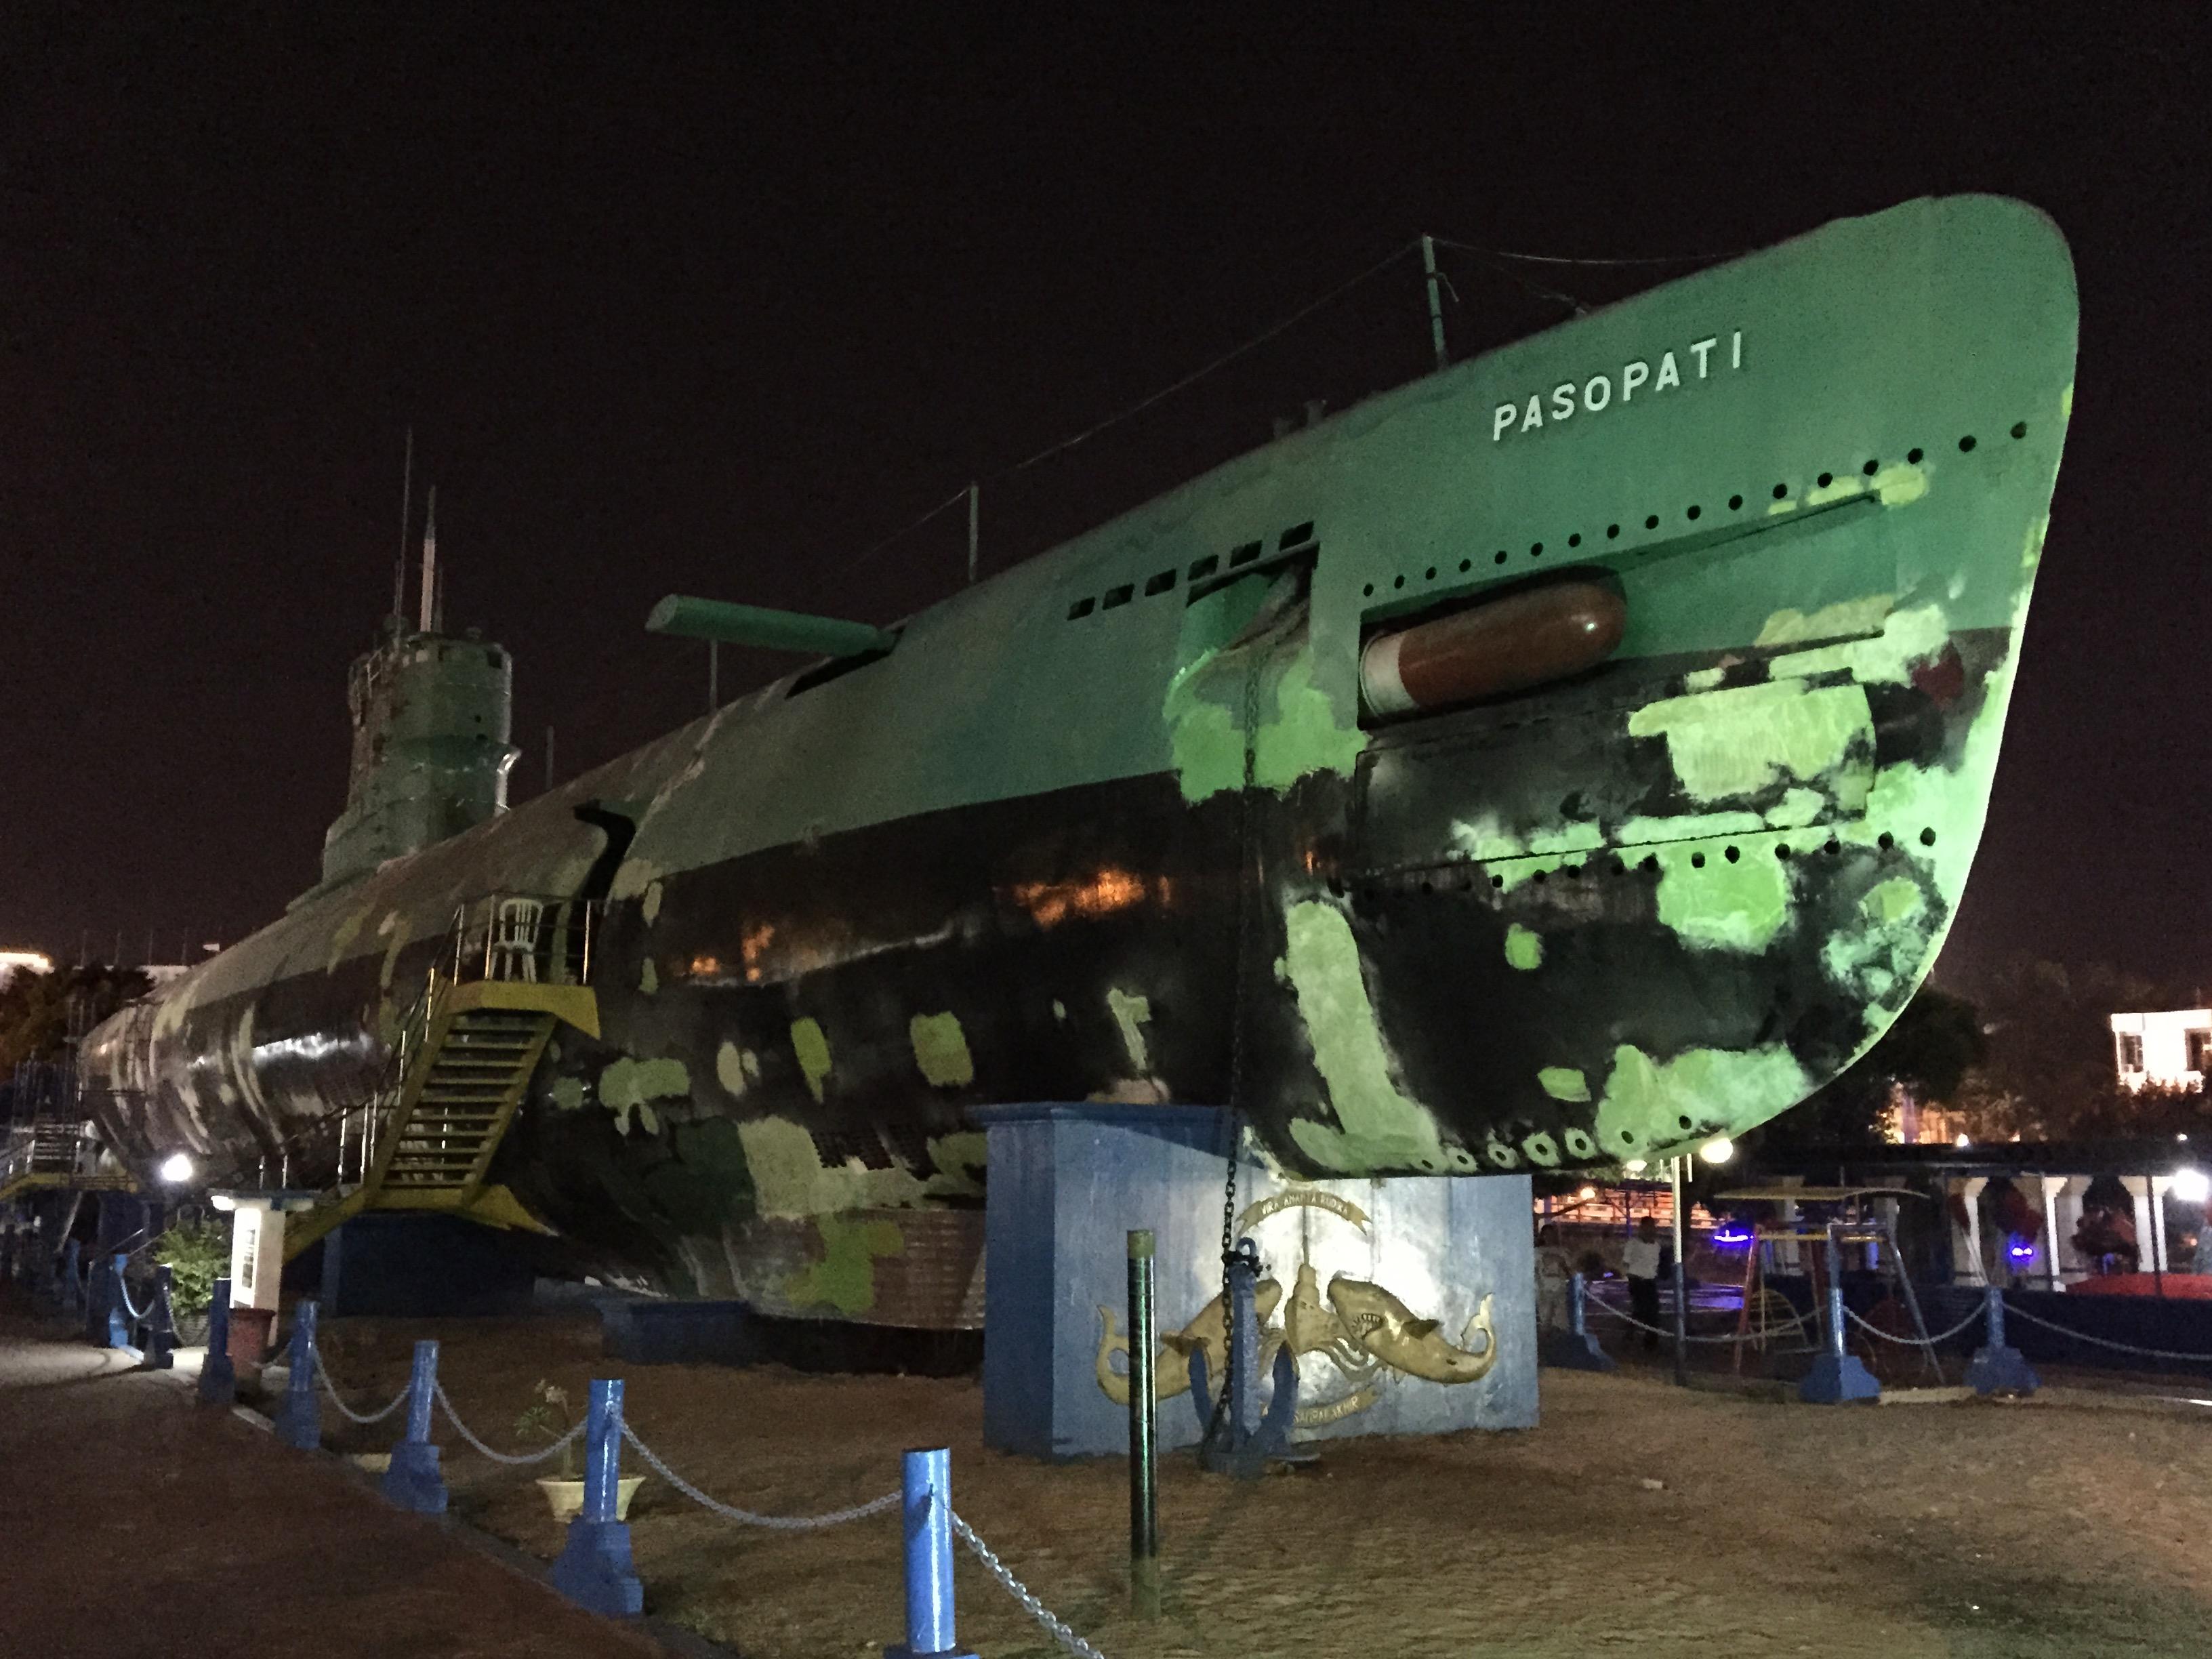 Cerita Dibalik Keberadaan Monumen Kapal Selam Surabaya Nunik Kri Pasopati